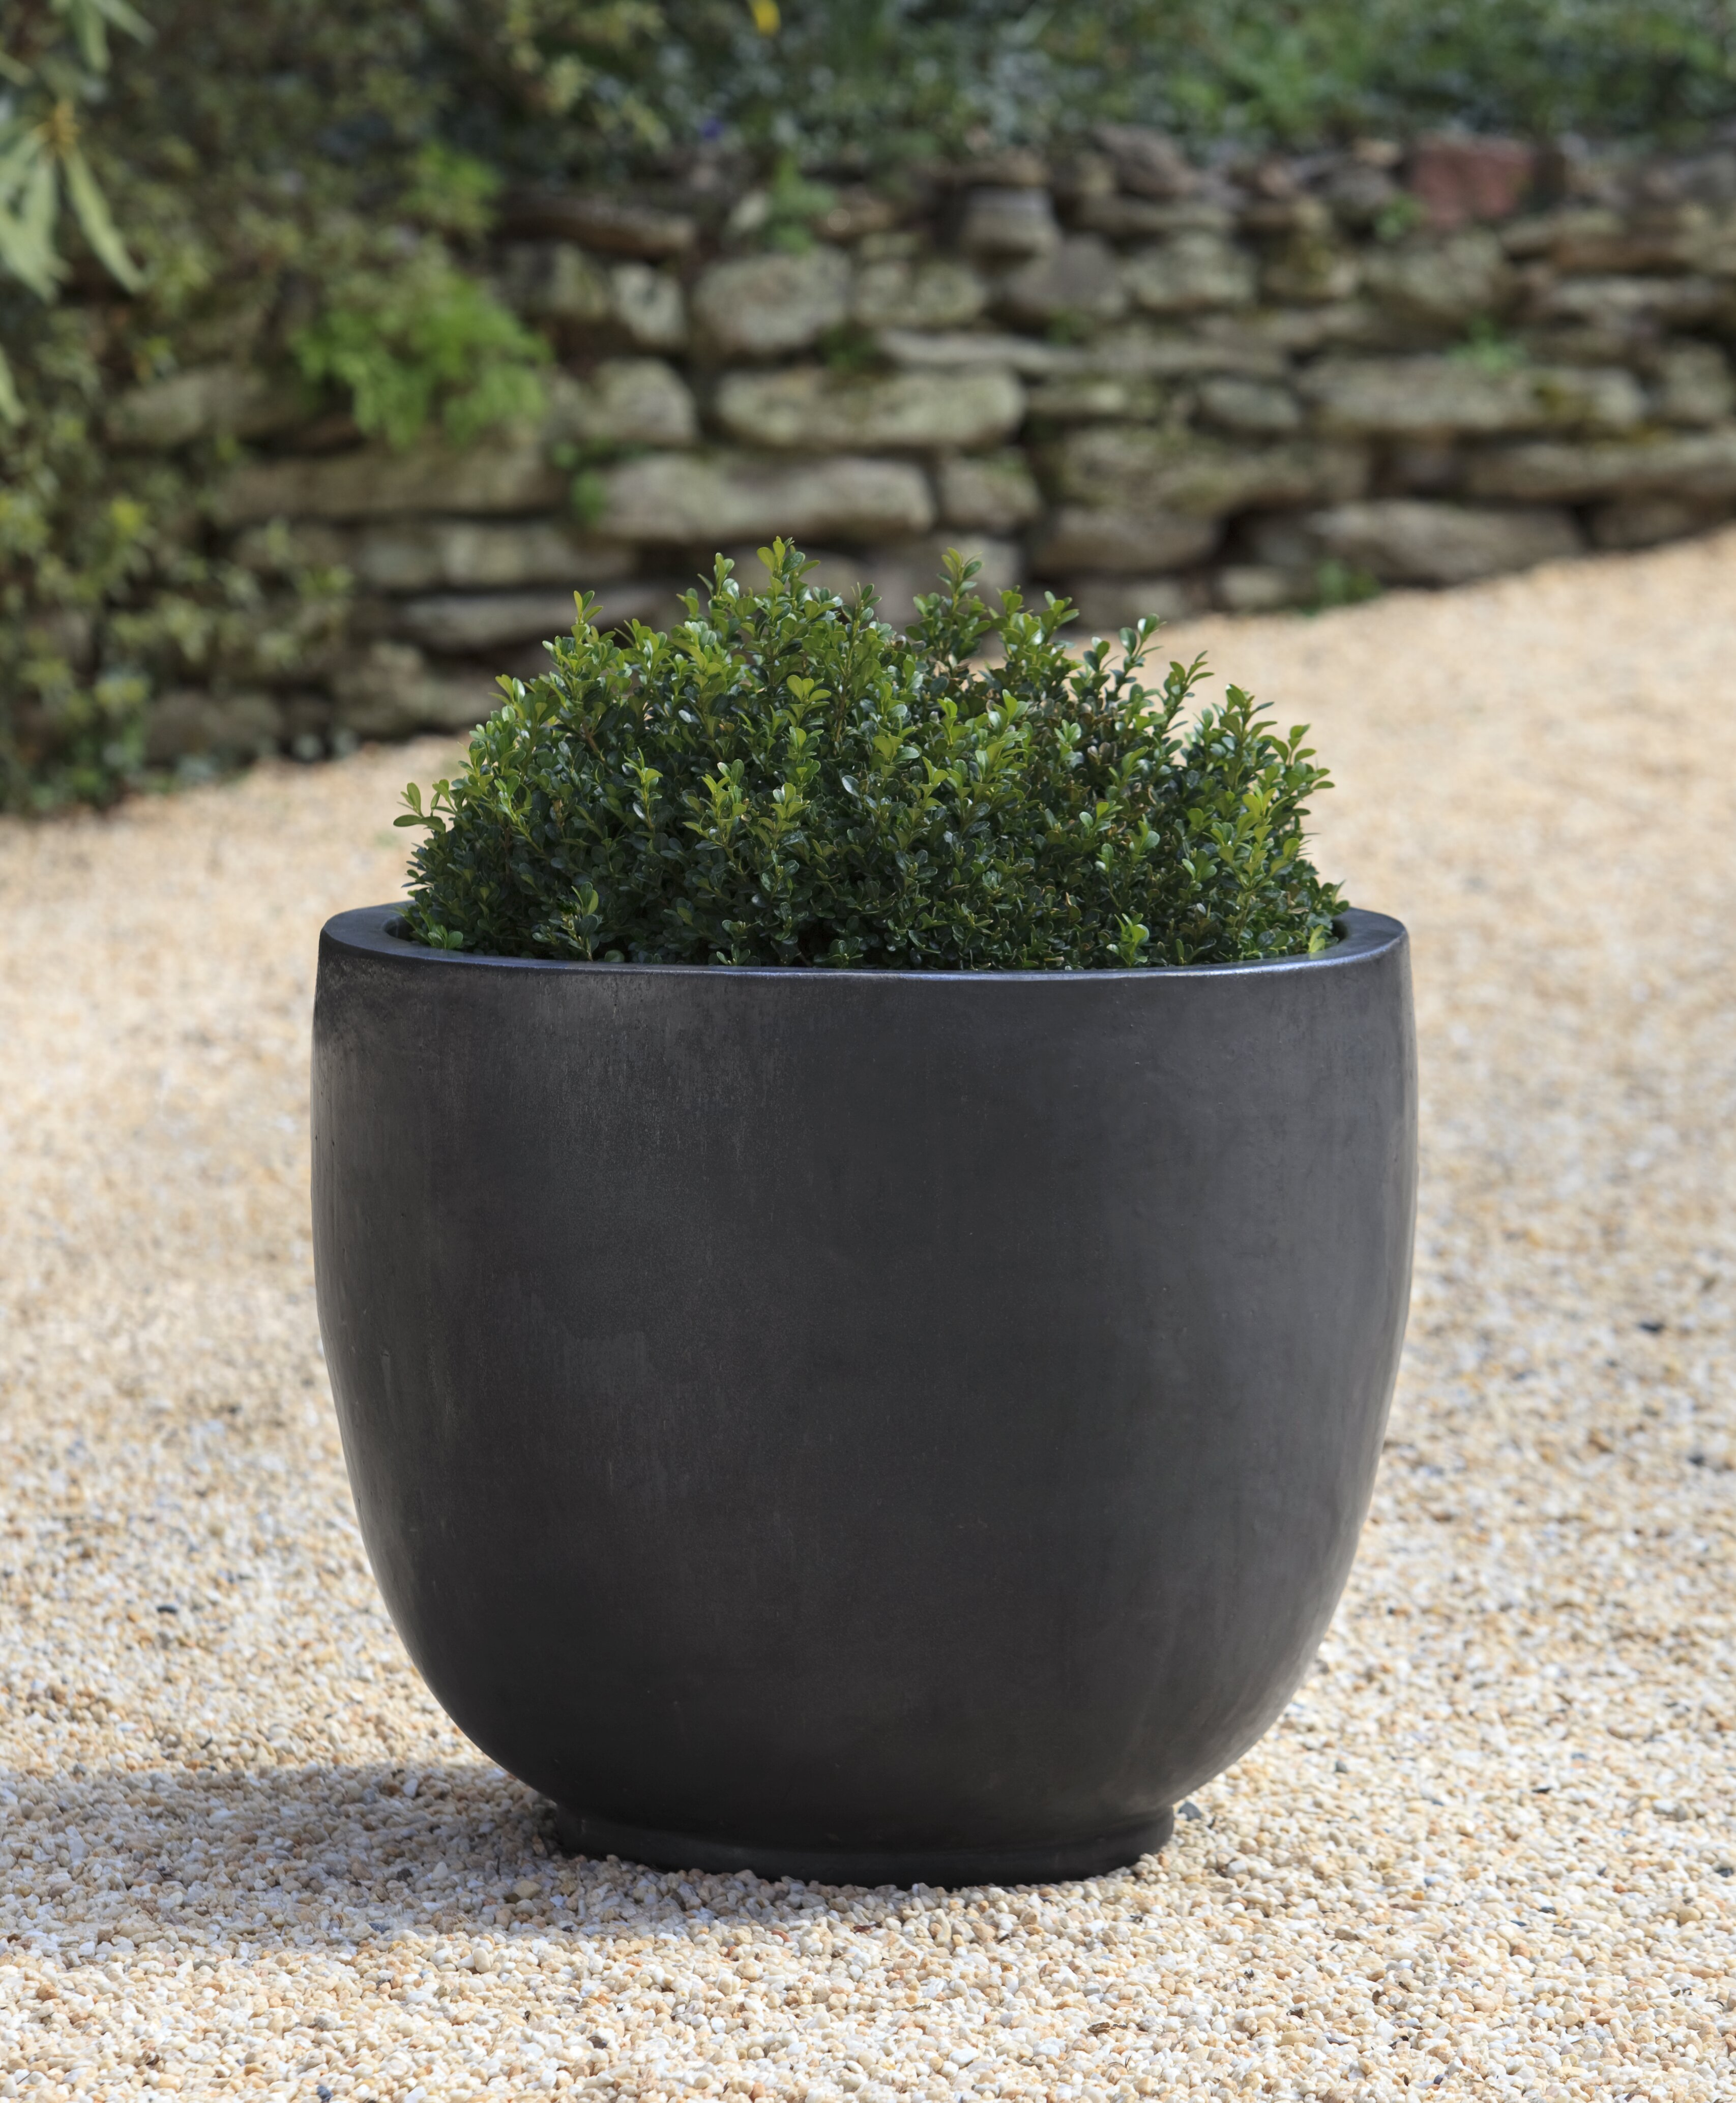 Wayfair Pot Campania International Planters You Ll Love In 2021